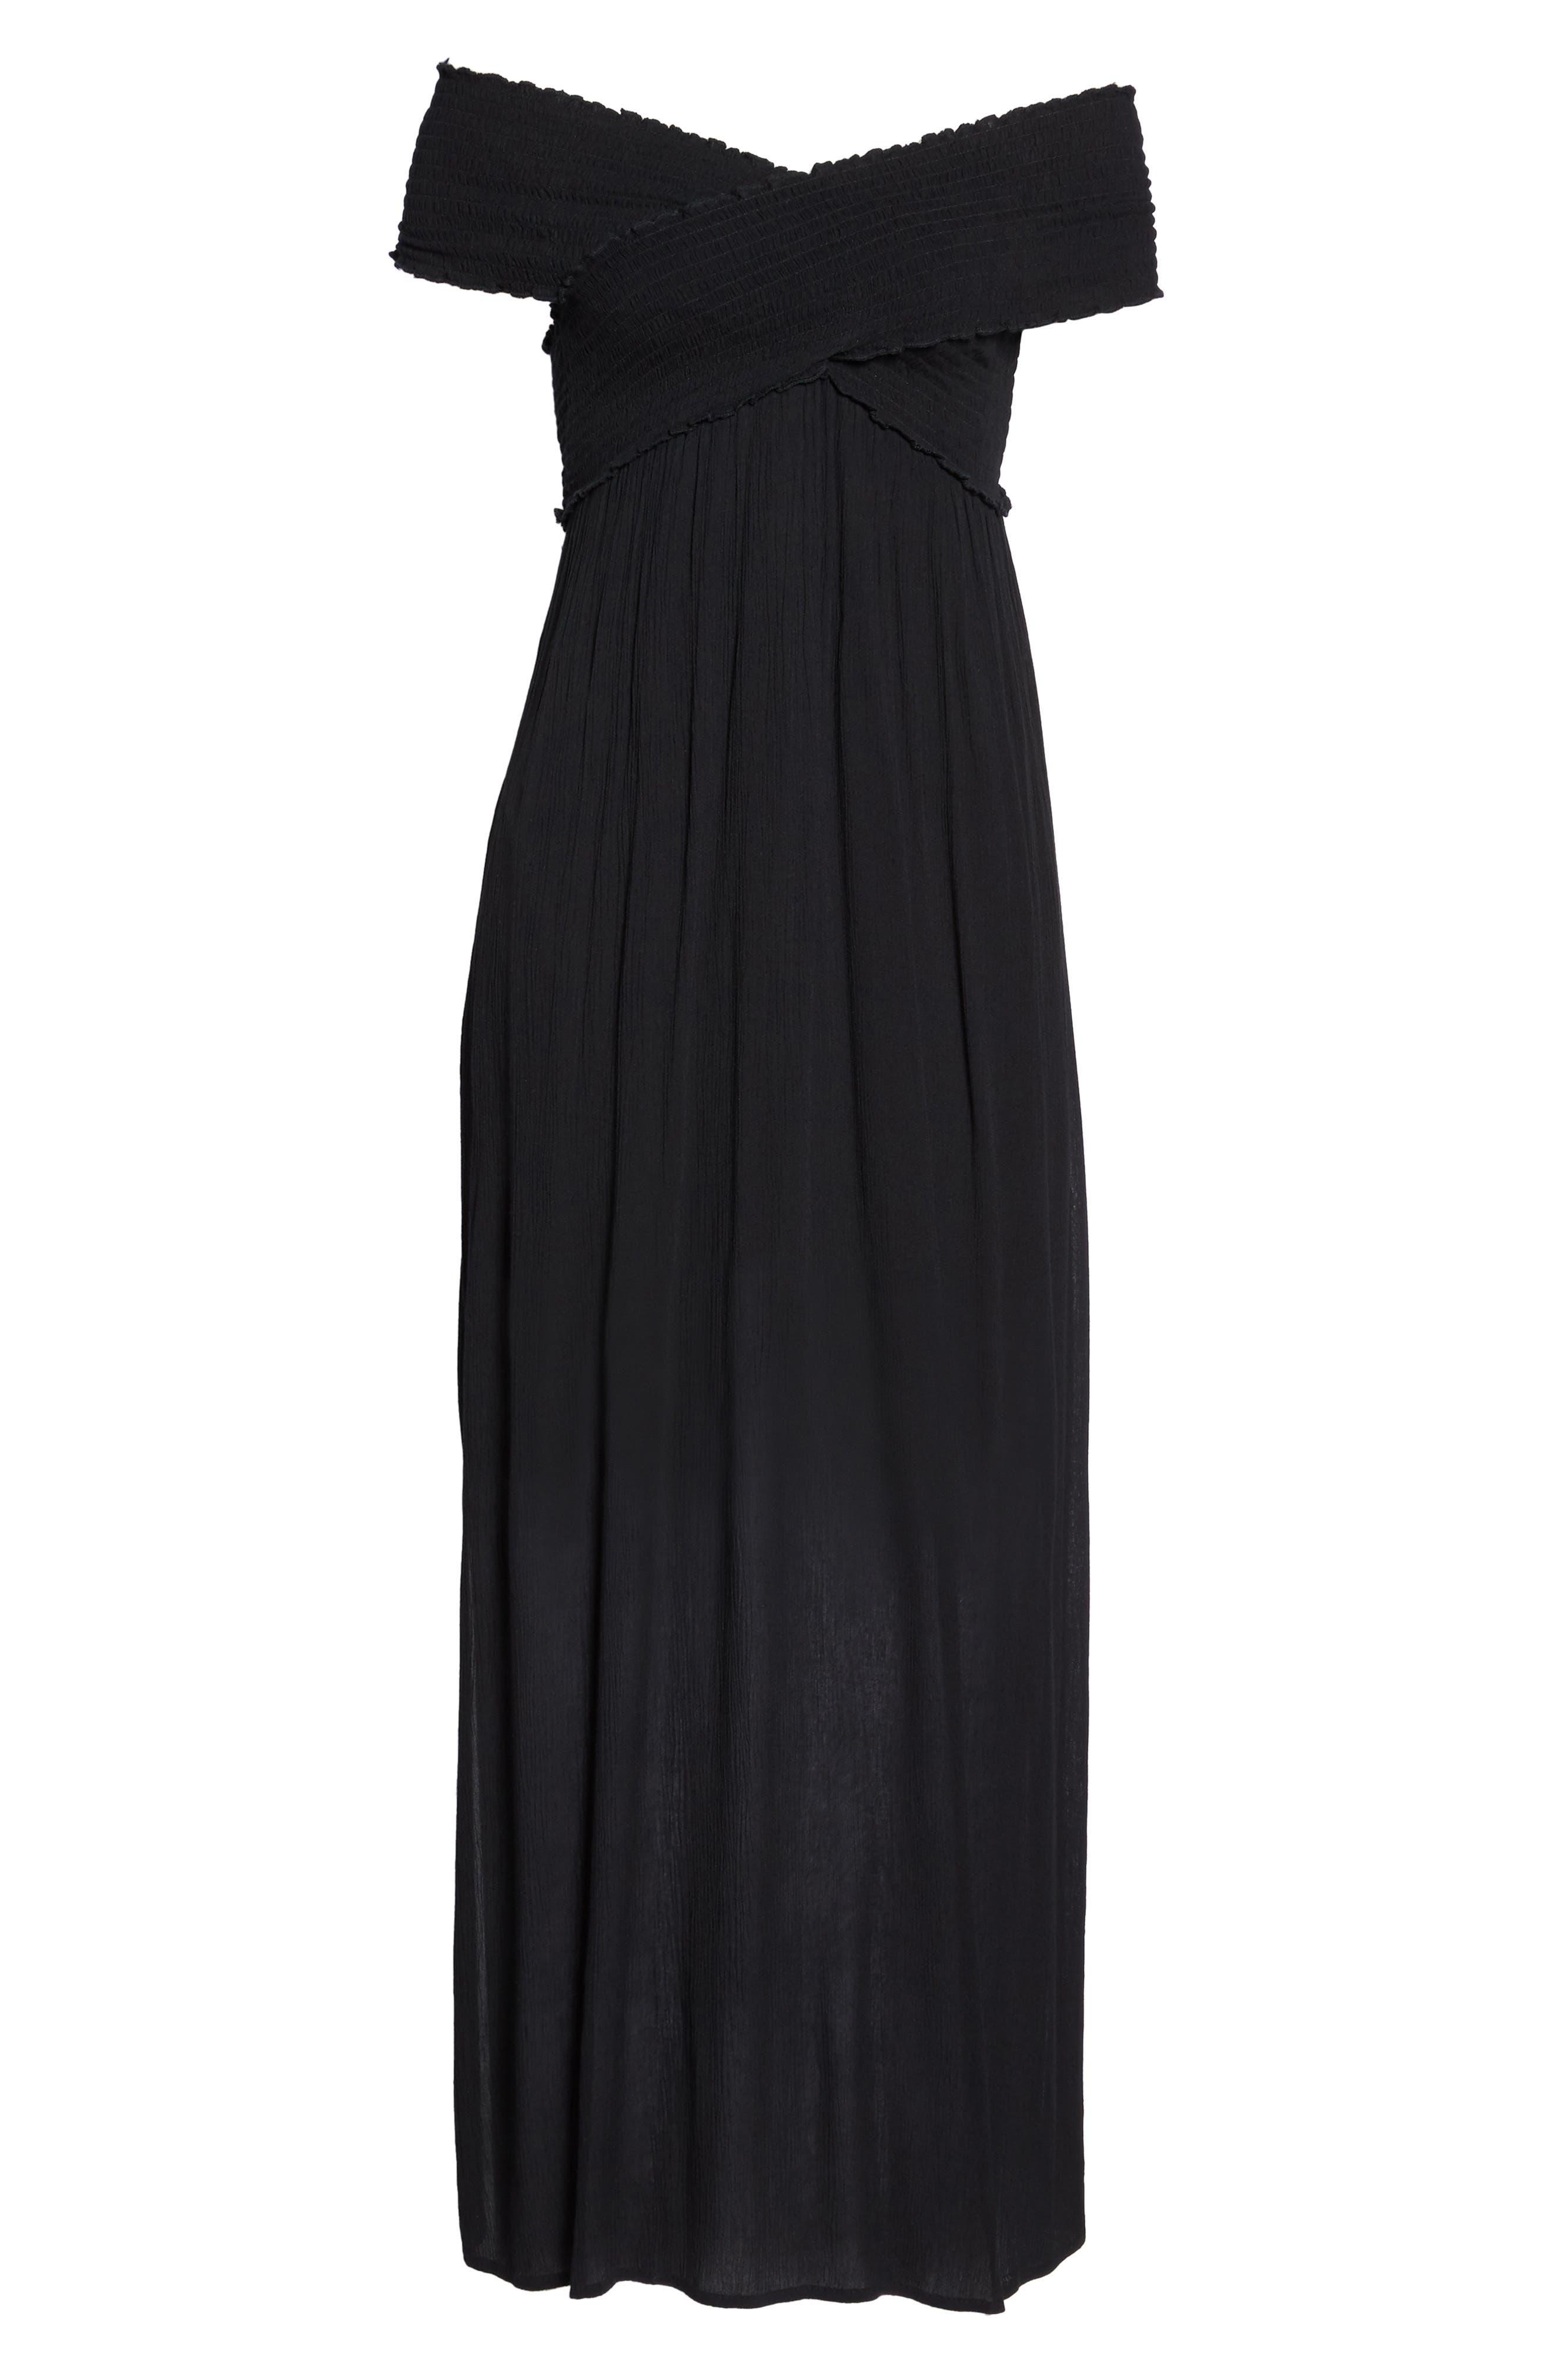 Smocked Off-the-Shoulder Cover-Up Maxi Dress,                             Alternate thumbnail 6, color,                             Black